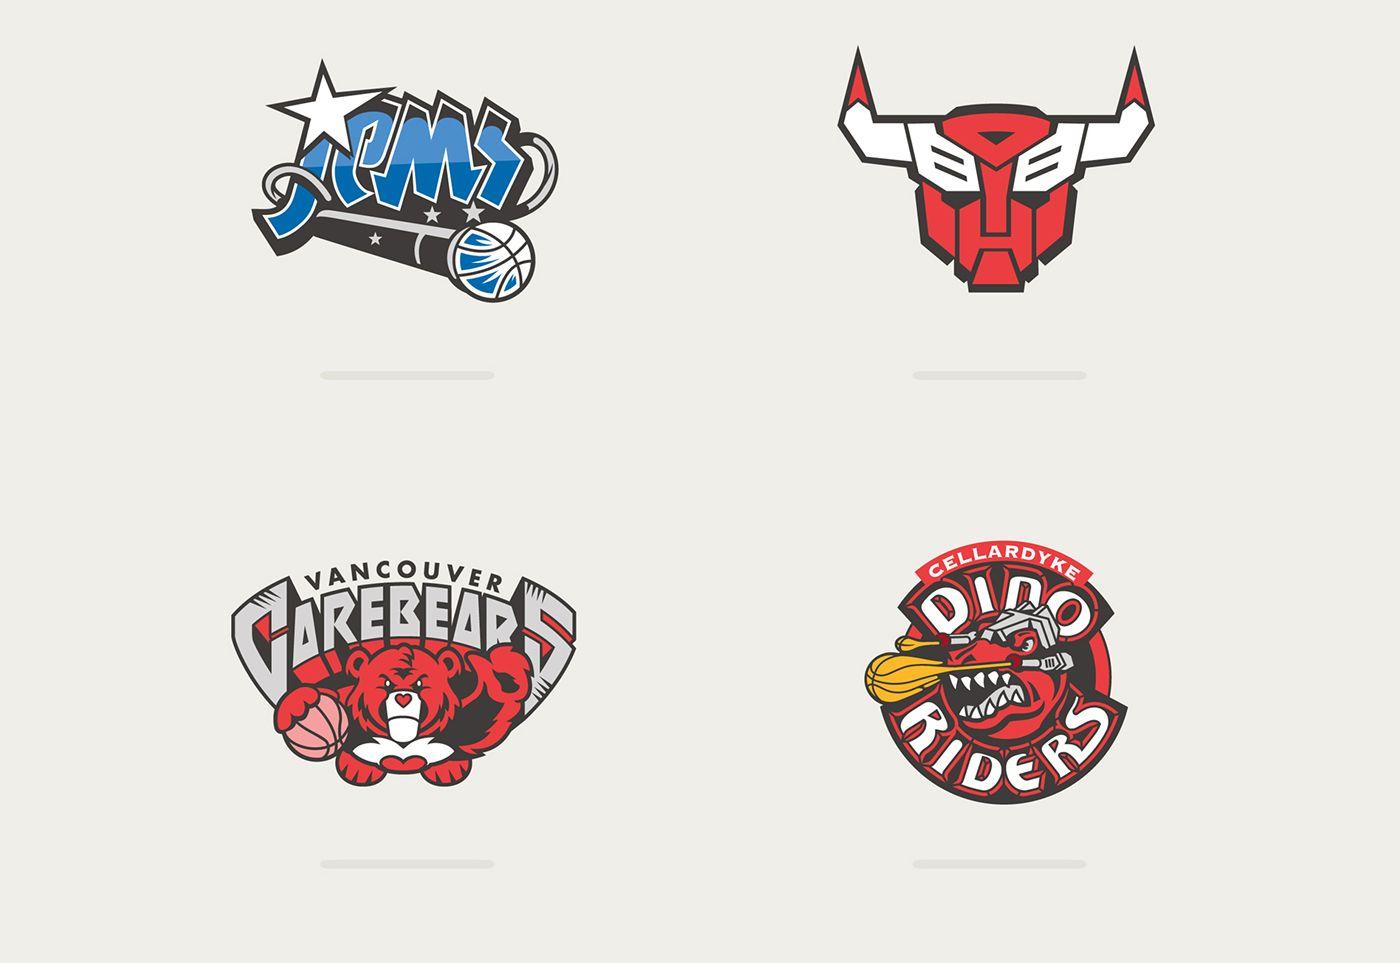 Les Logos De Franchises Nba Version Cartoons Nba Fashion Basketball Art Classic Cartoons